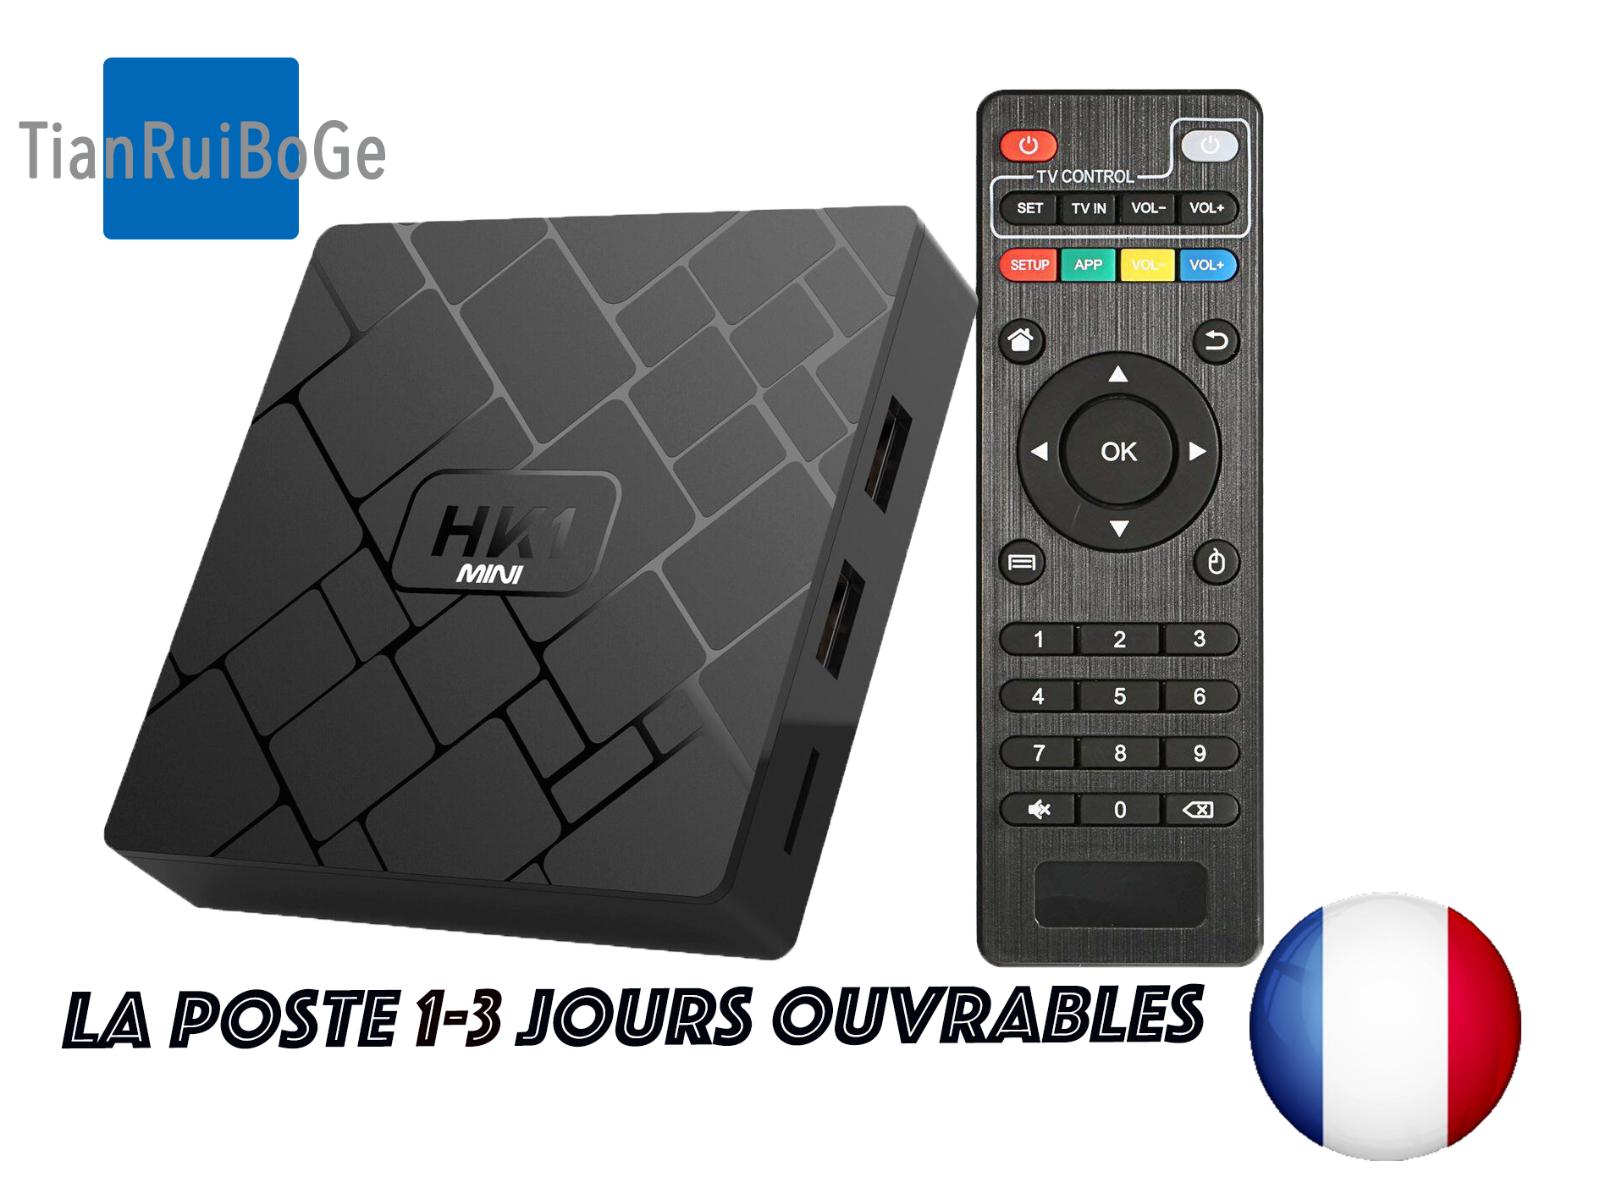 hk1mini android 9.0 2gb+16gb wifi 2.4g quad core rk3329 smart tv box